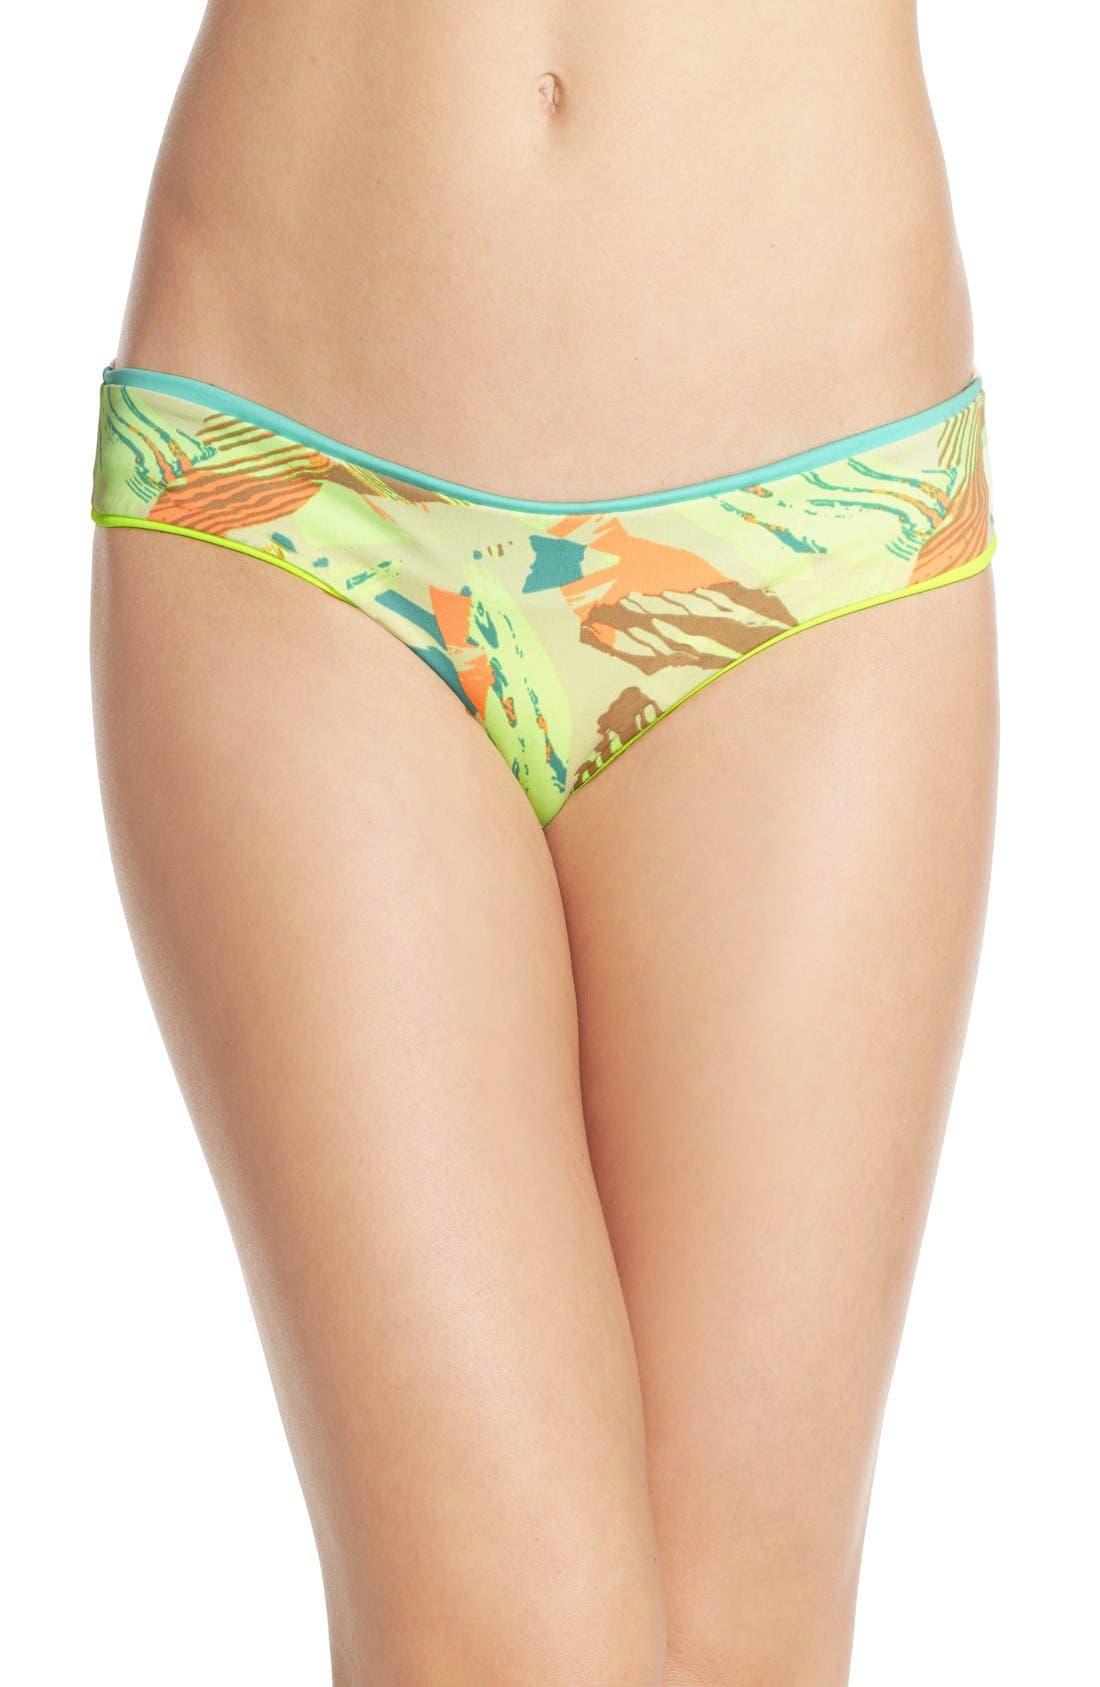 Alternate Image 3  - Maaji 'Lime Cubism' Reversible Bikini Bottoms